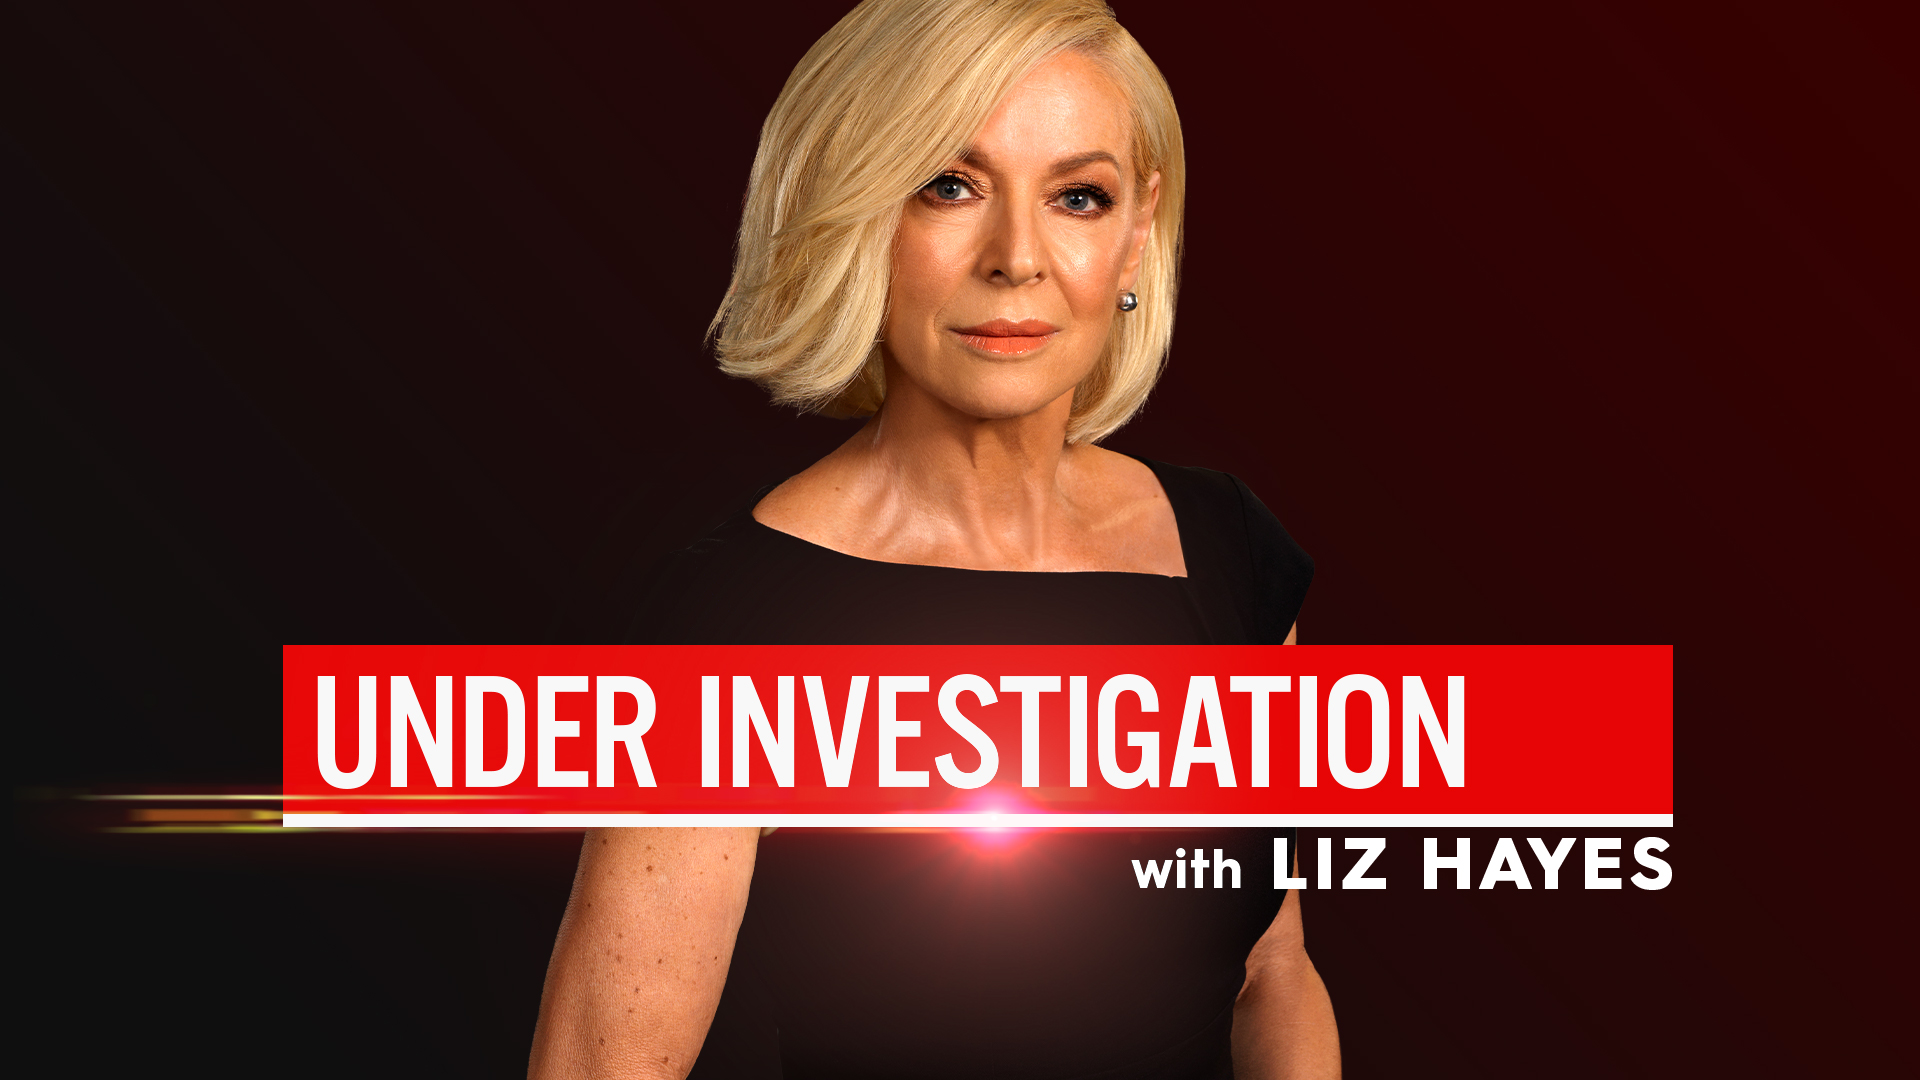 Under Investigation with Liz Hayes: premieres this week